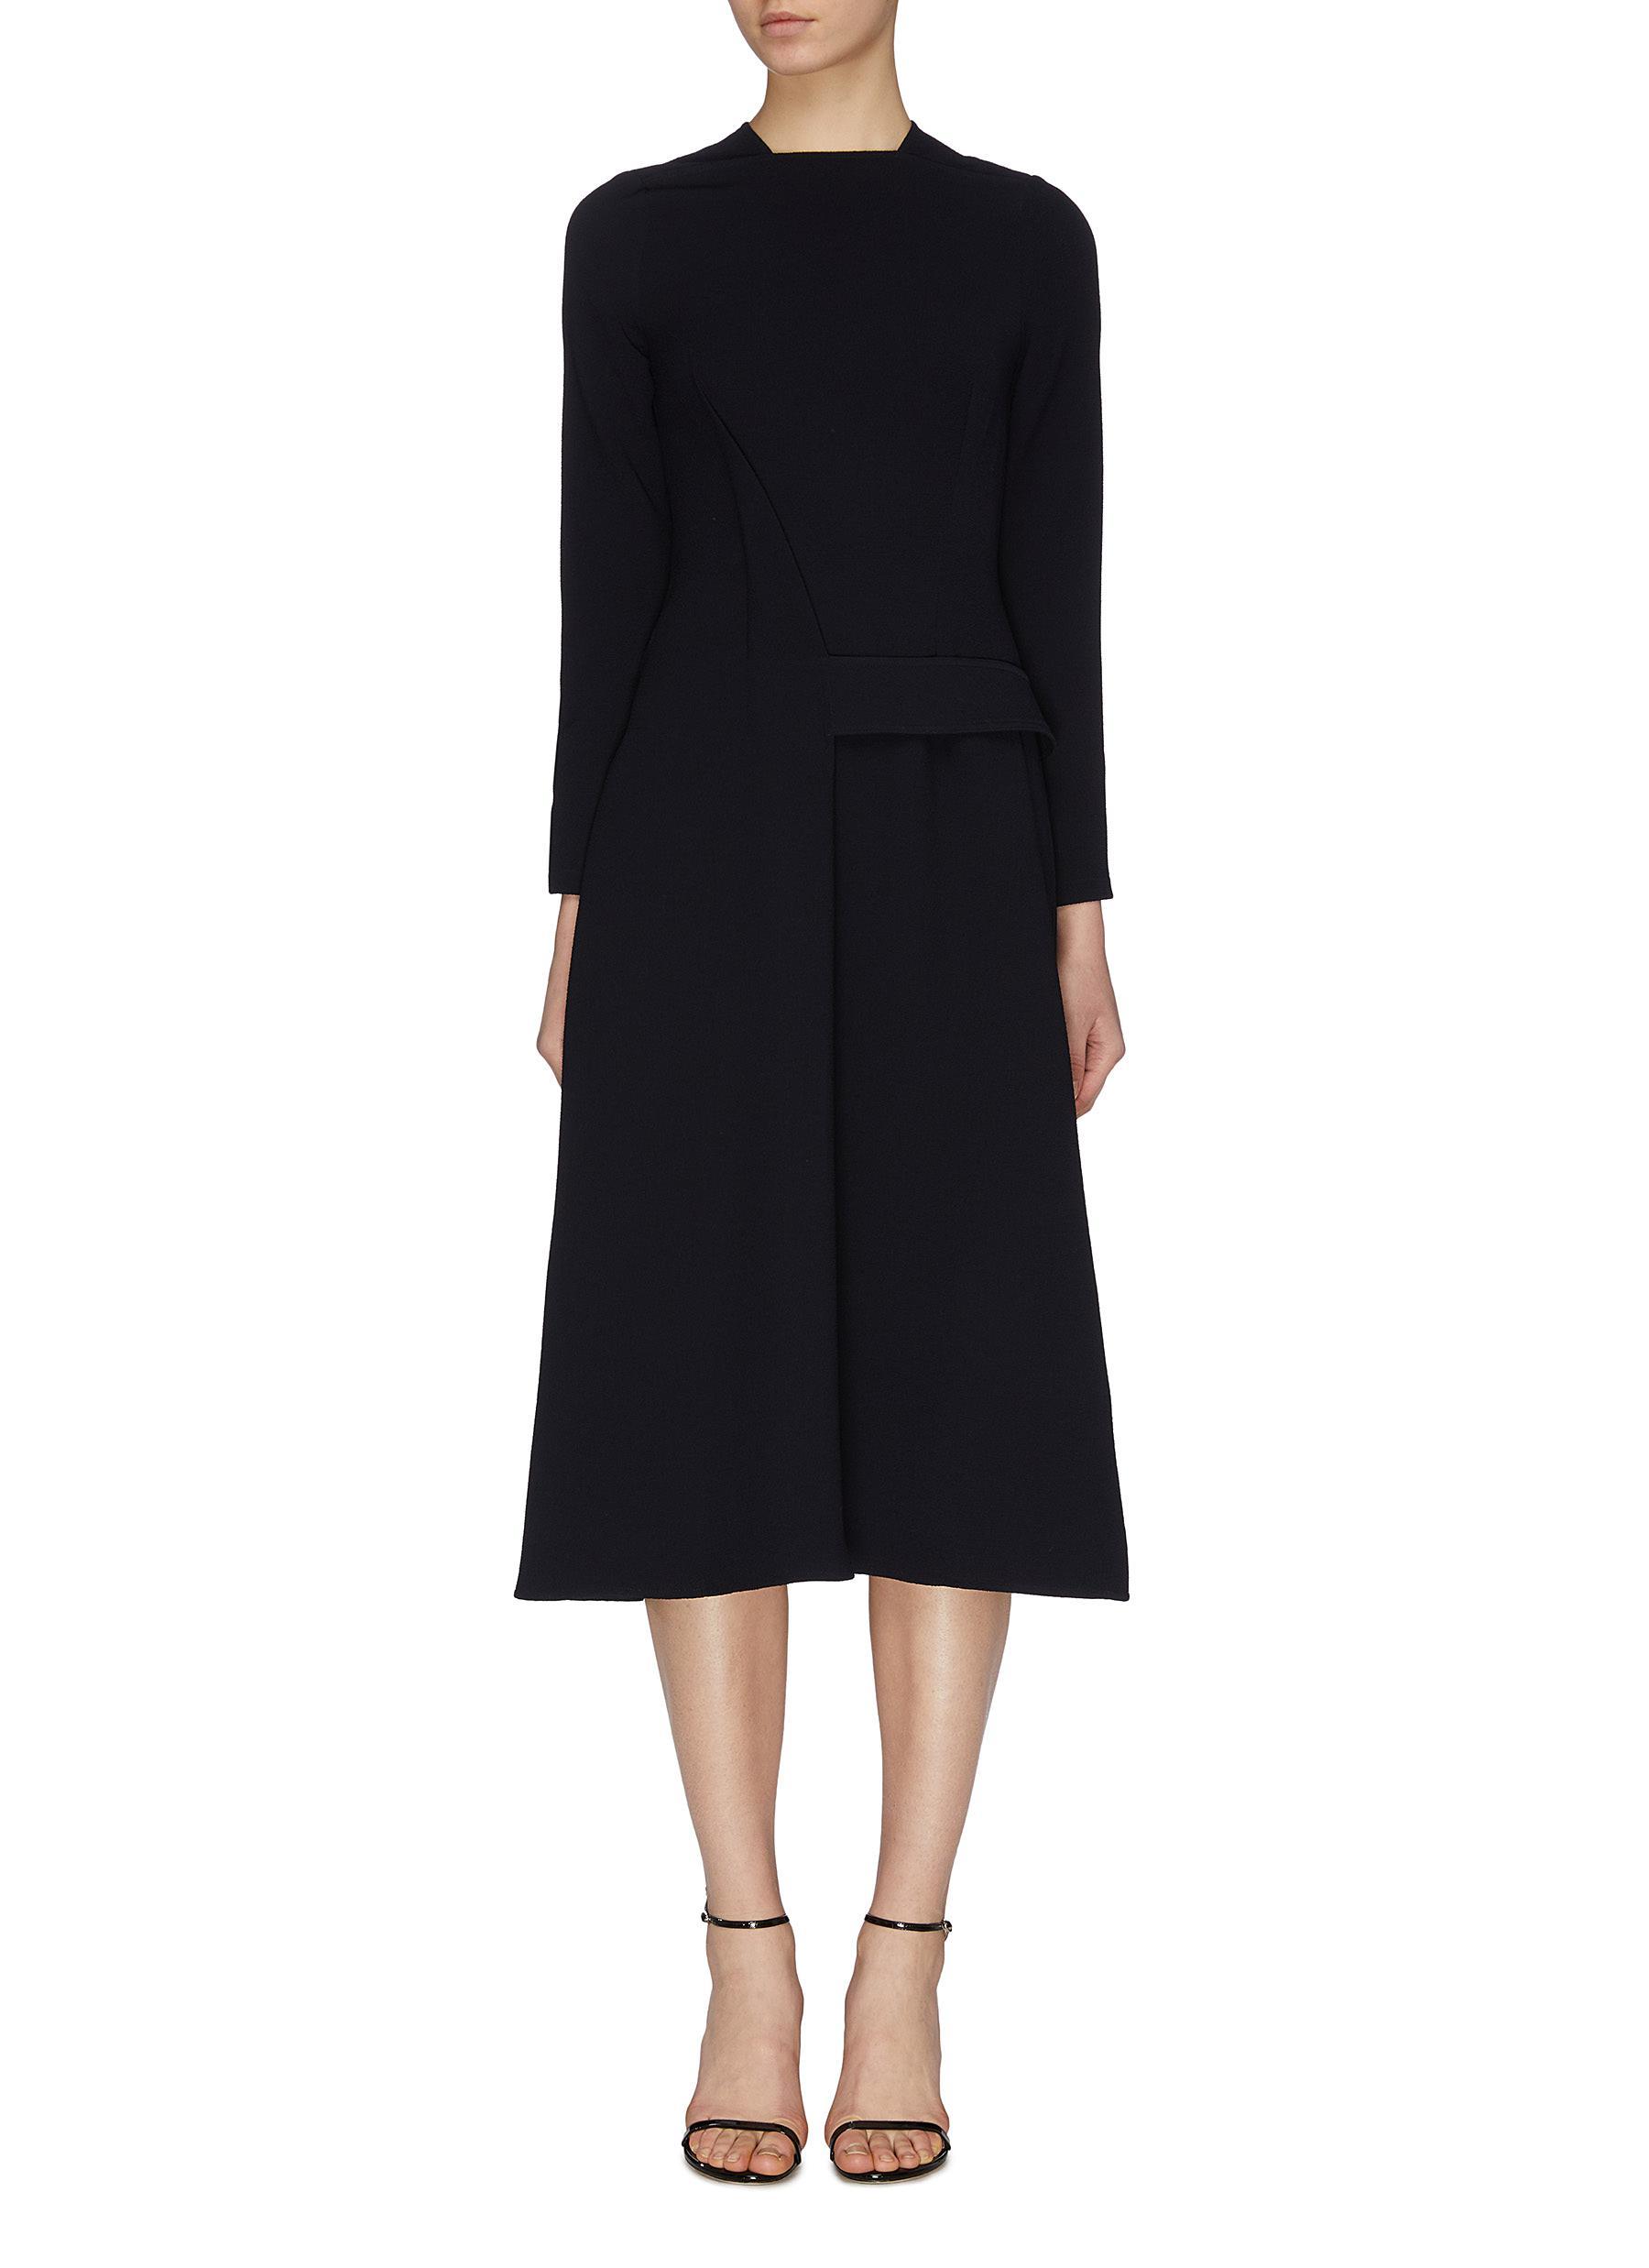 Buy Victoria Beckham Dresses Belted wrap around dress